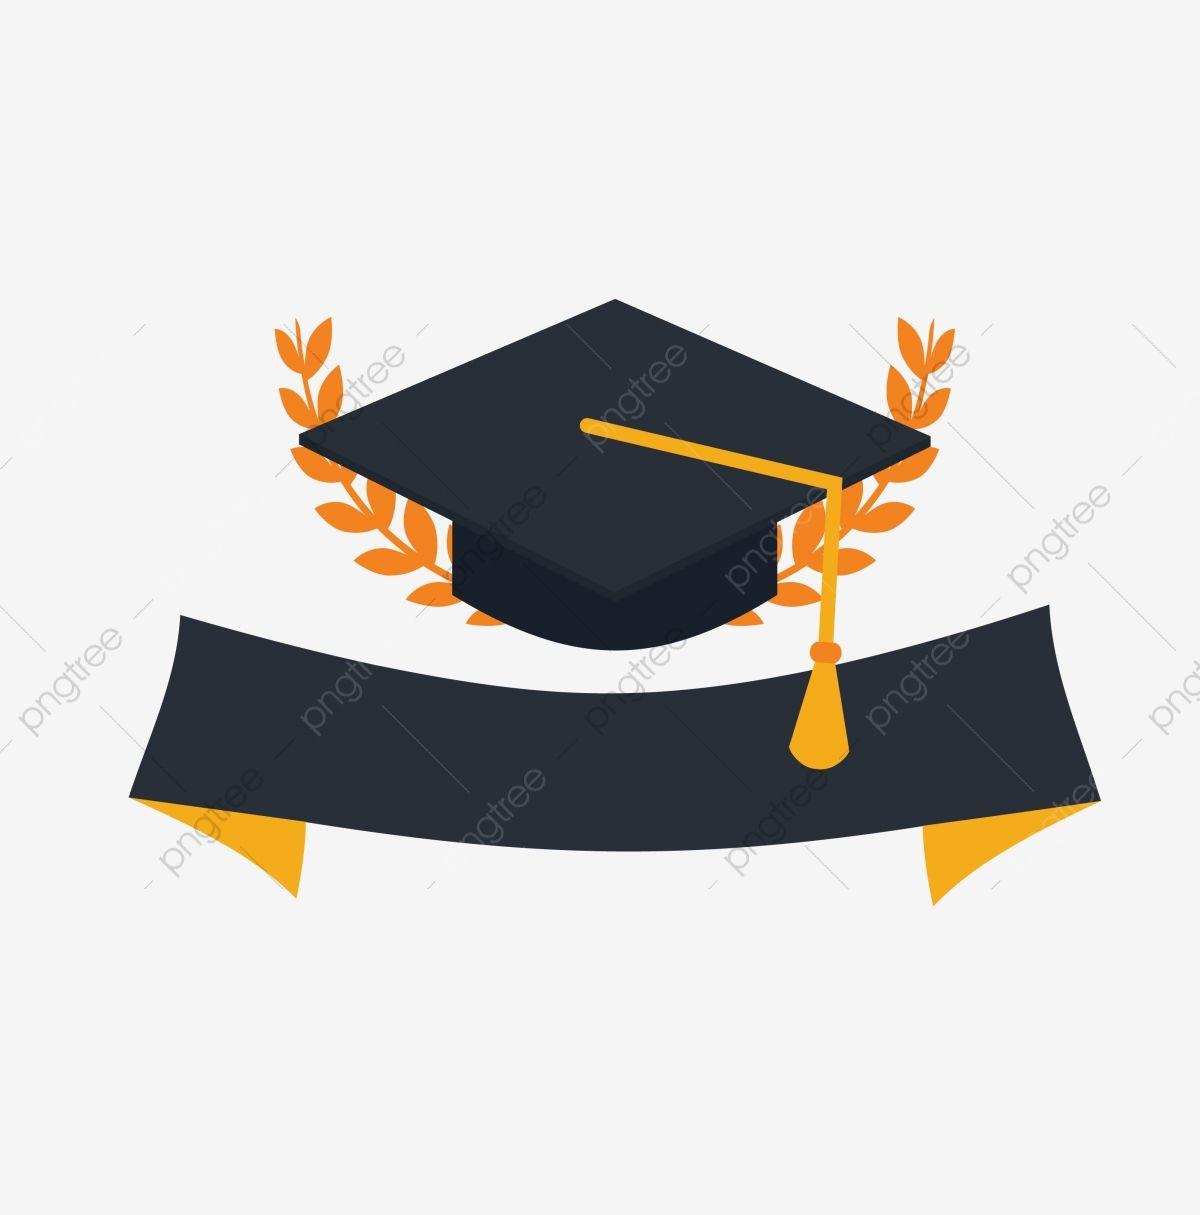 Cartoon Graduation Season Hat Hat Graduation Season Decoration Graduation Hat Clipart Graduation Hat Graduation Season Hat Png And Vector With Transparent Ba Graduation Hat Graduation Graduation Party Decor